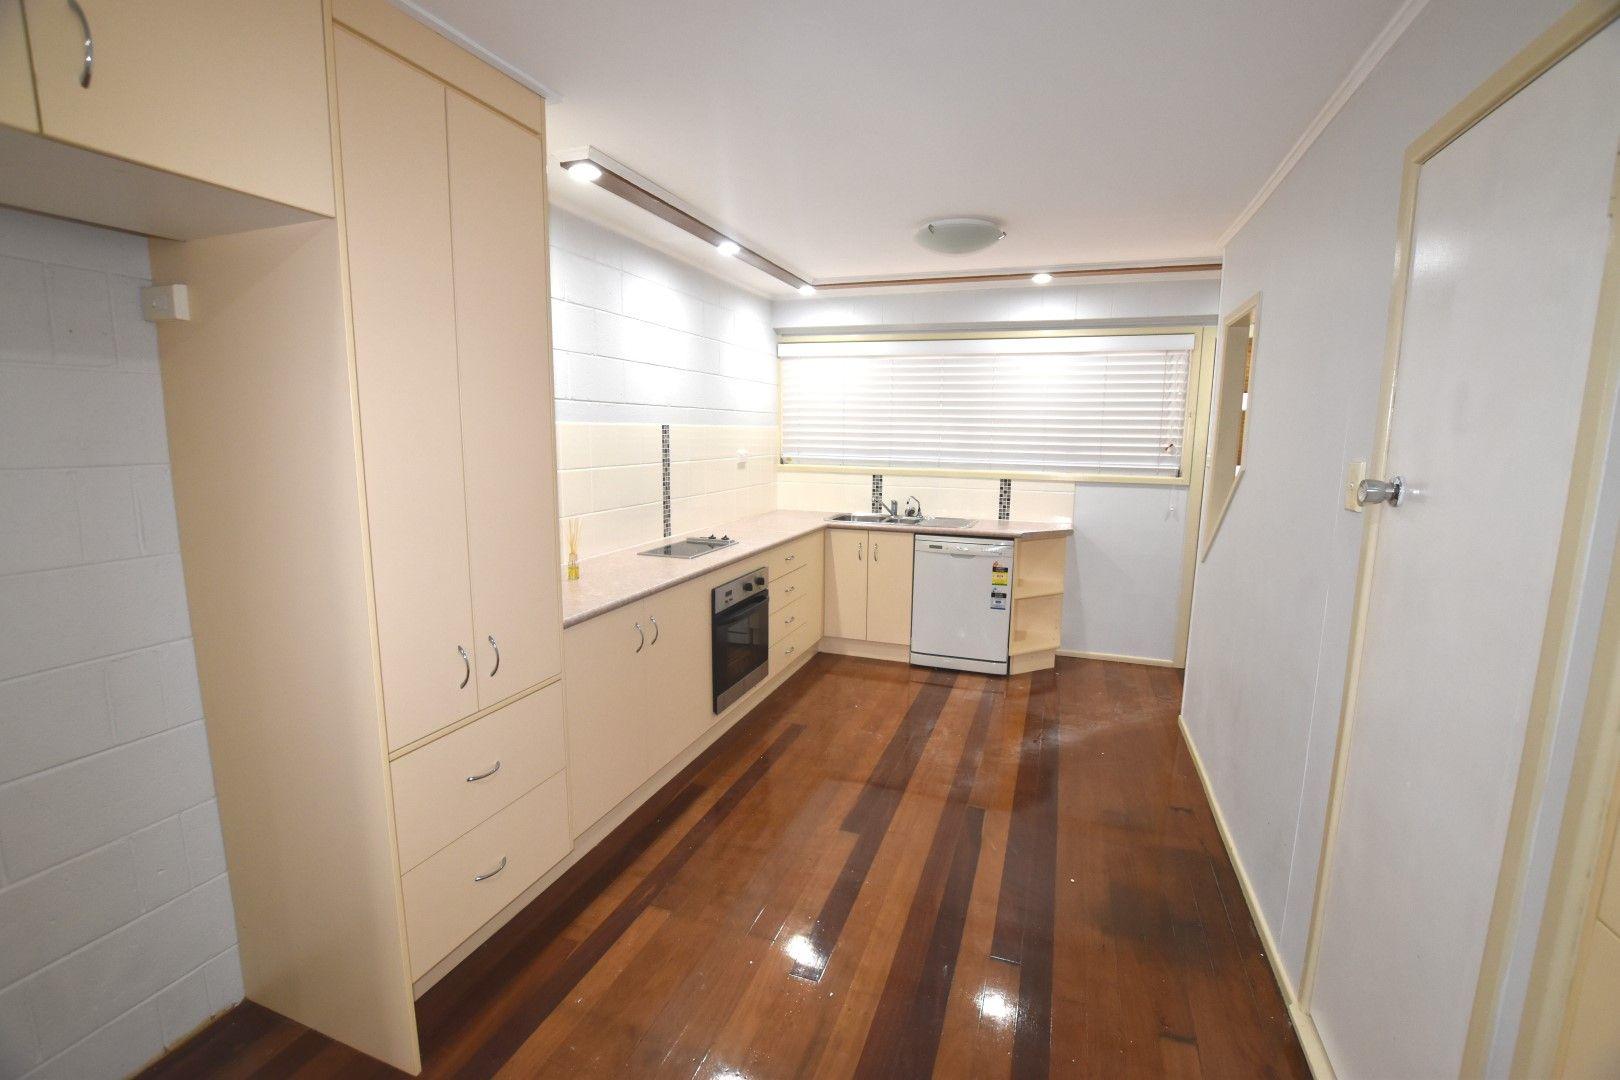 8/9 Scenery Street, West Gladstone QLD 4680, Image 2